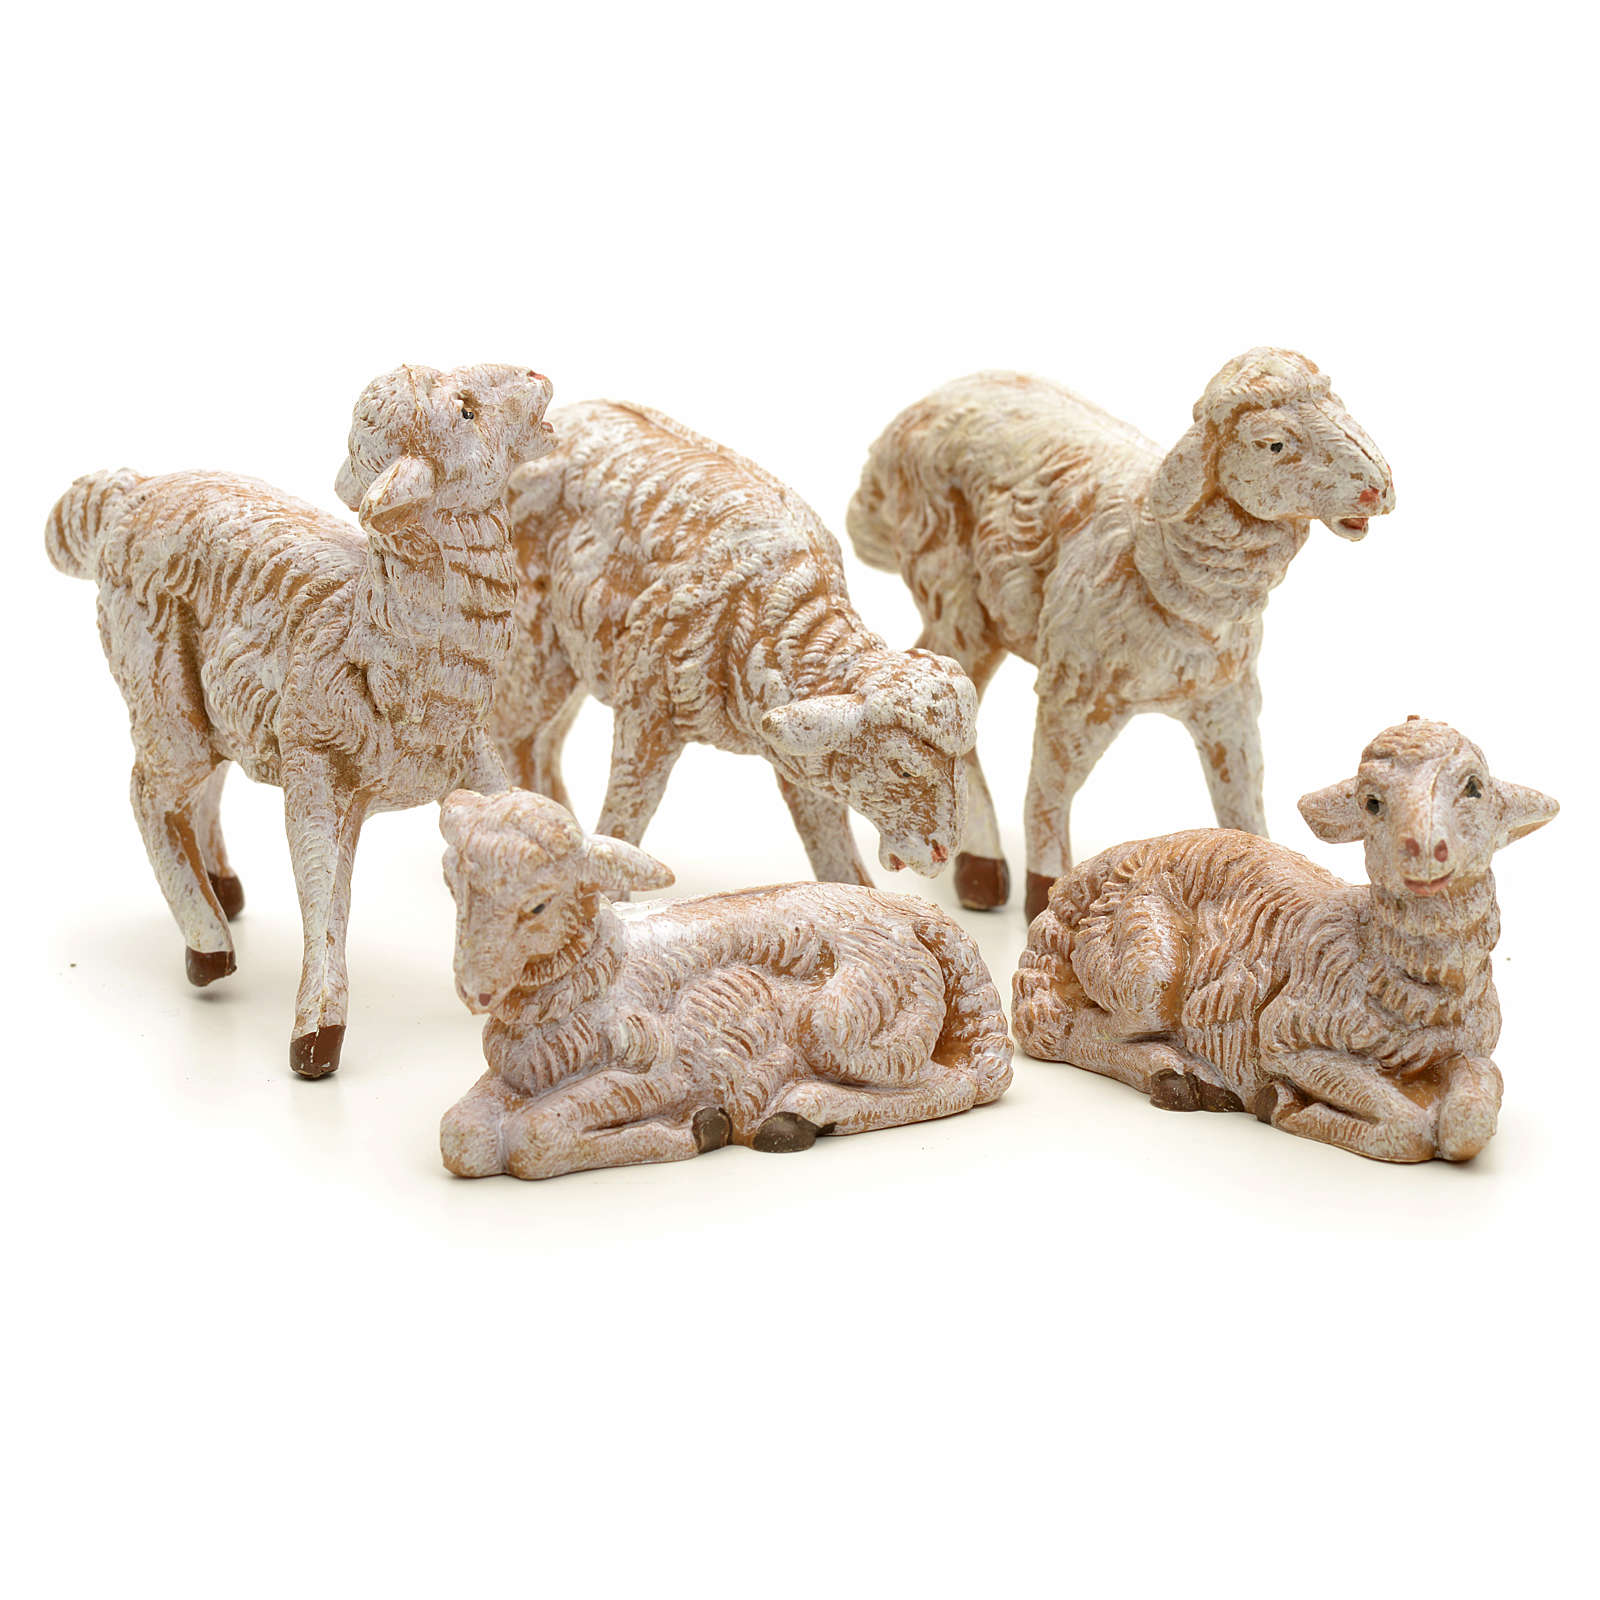 Schafe 5 Stücke Fontanini 12 cm 4